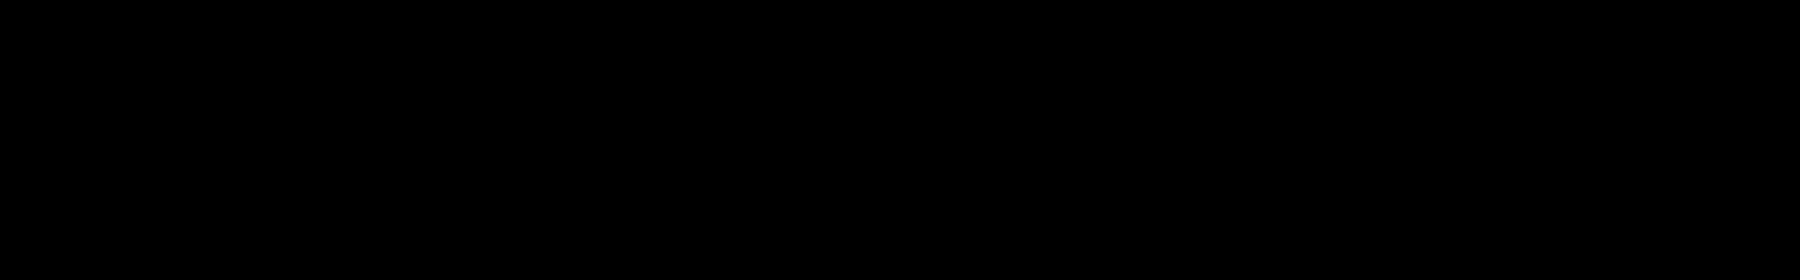 LO-FI for RC-20 audio waveform